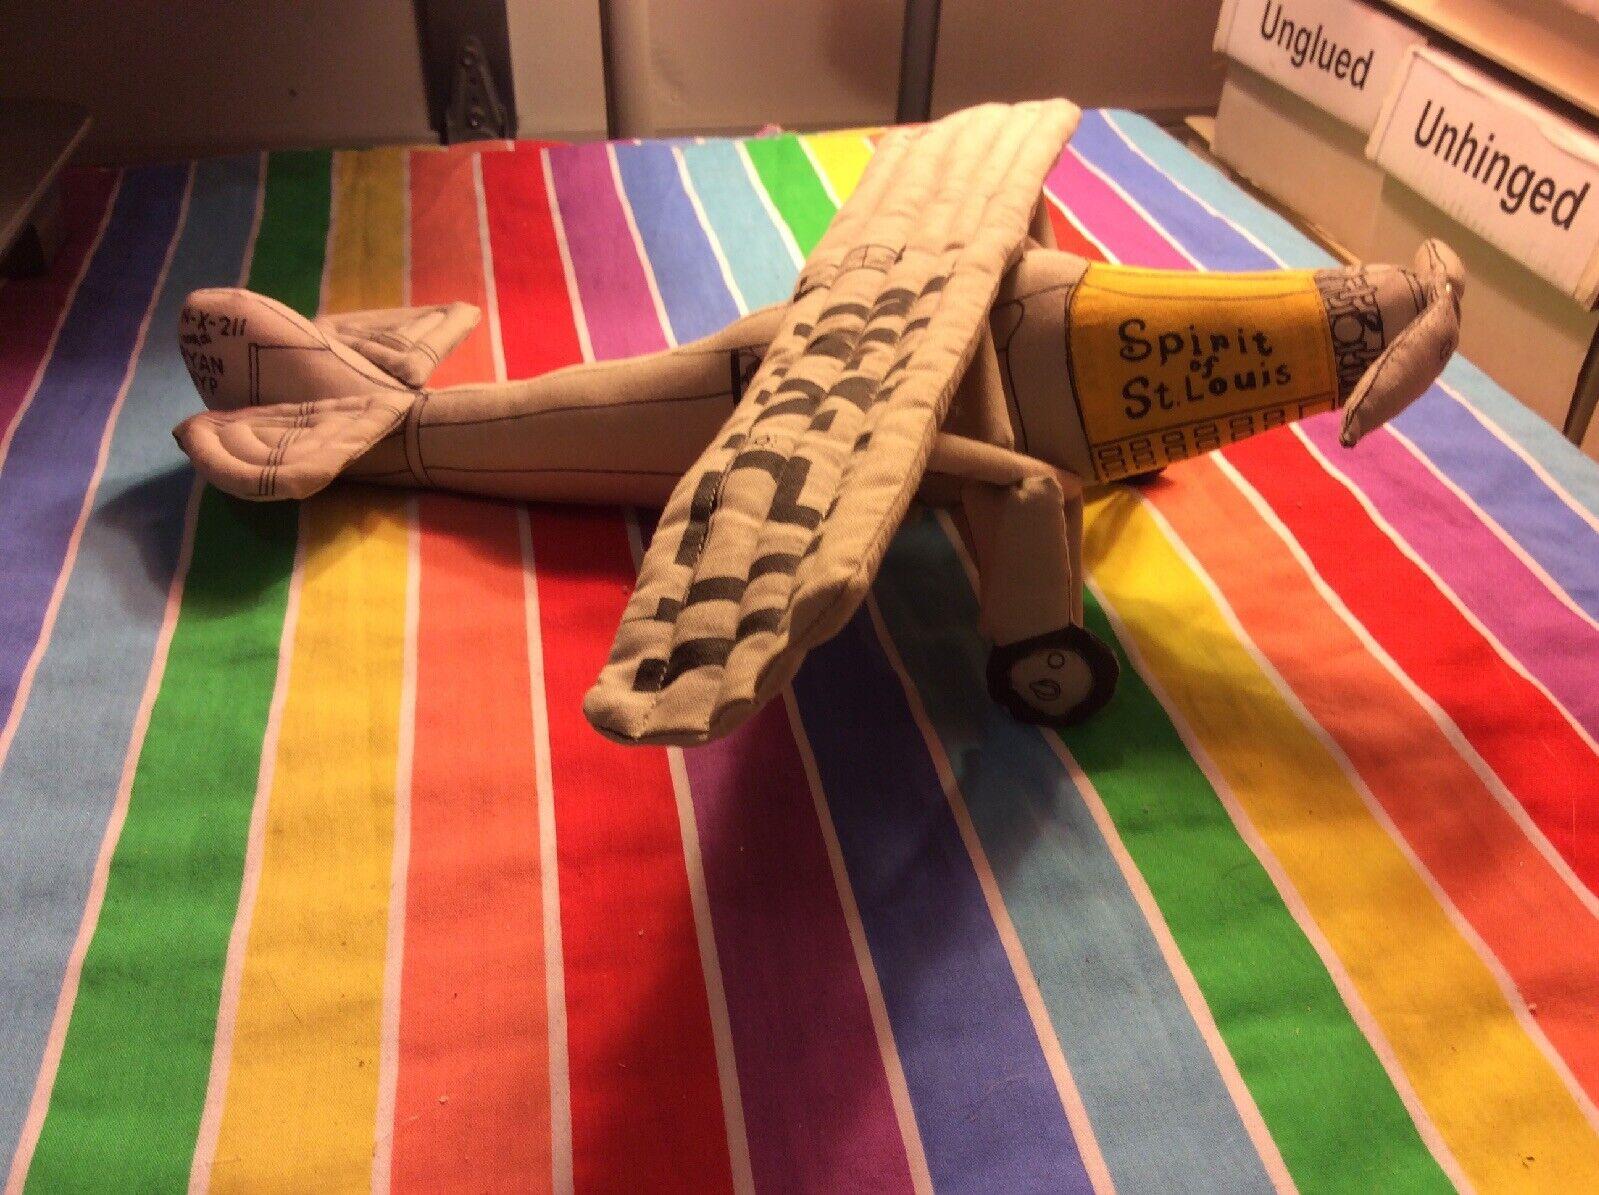 RARE Flight Legend Ryan NYP Spirit Spirit Spirit of St. Louis PLUSH N-X-211 Charles Lindbergh 4ee3a9